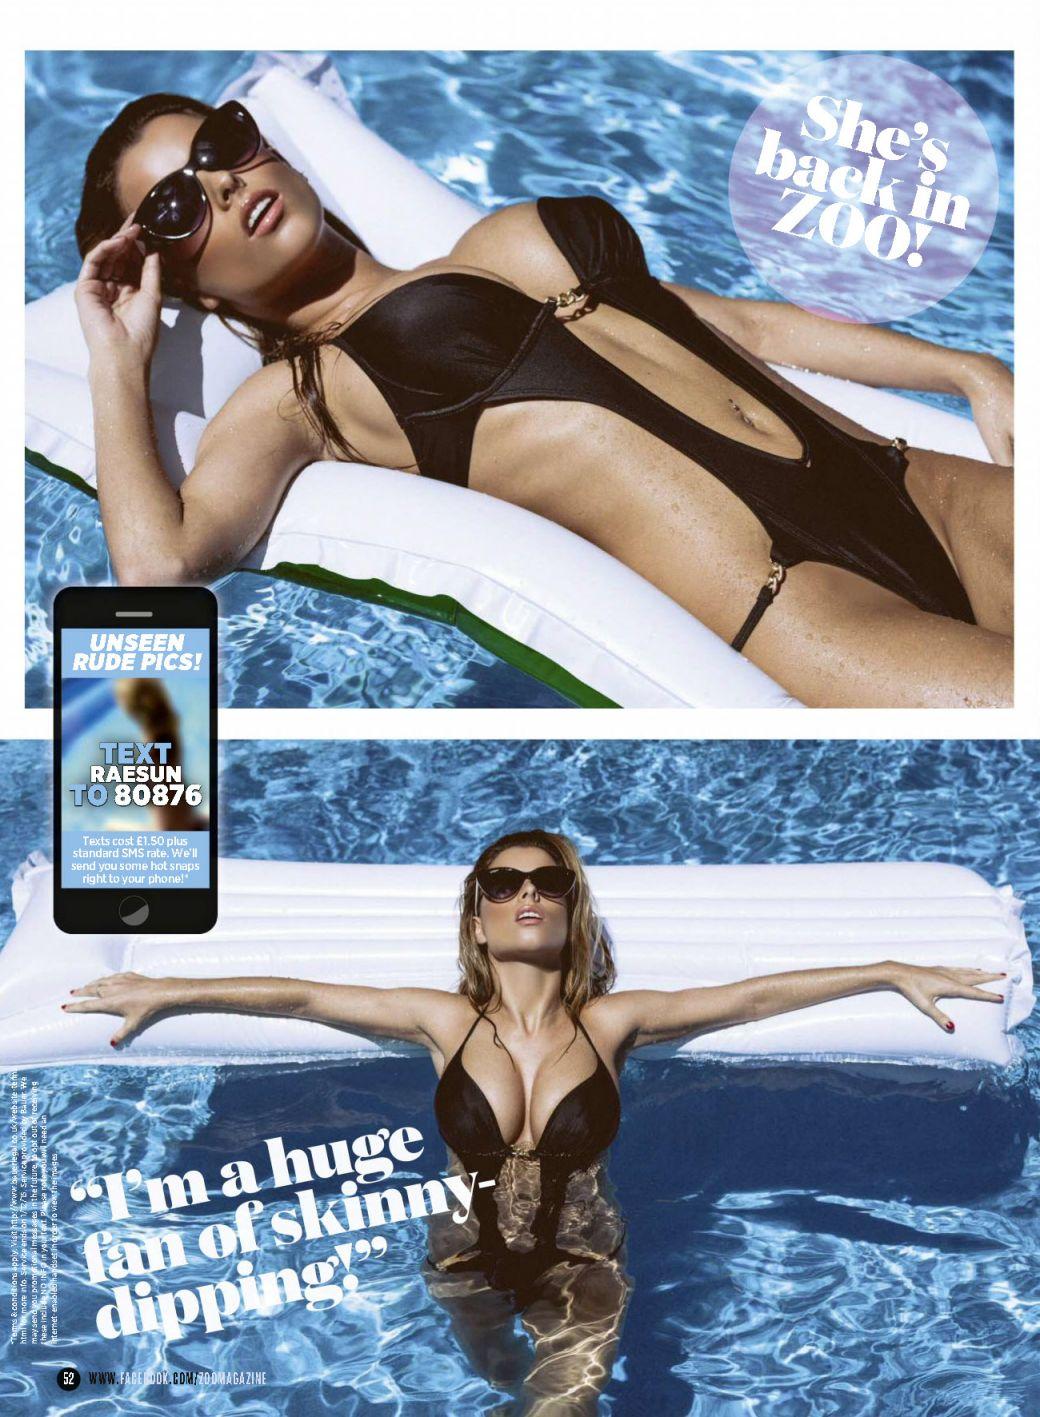 Rae Wearing Bikini In The Pages Of ZOO Magazine 3